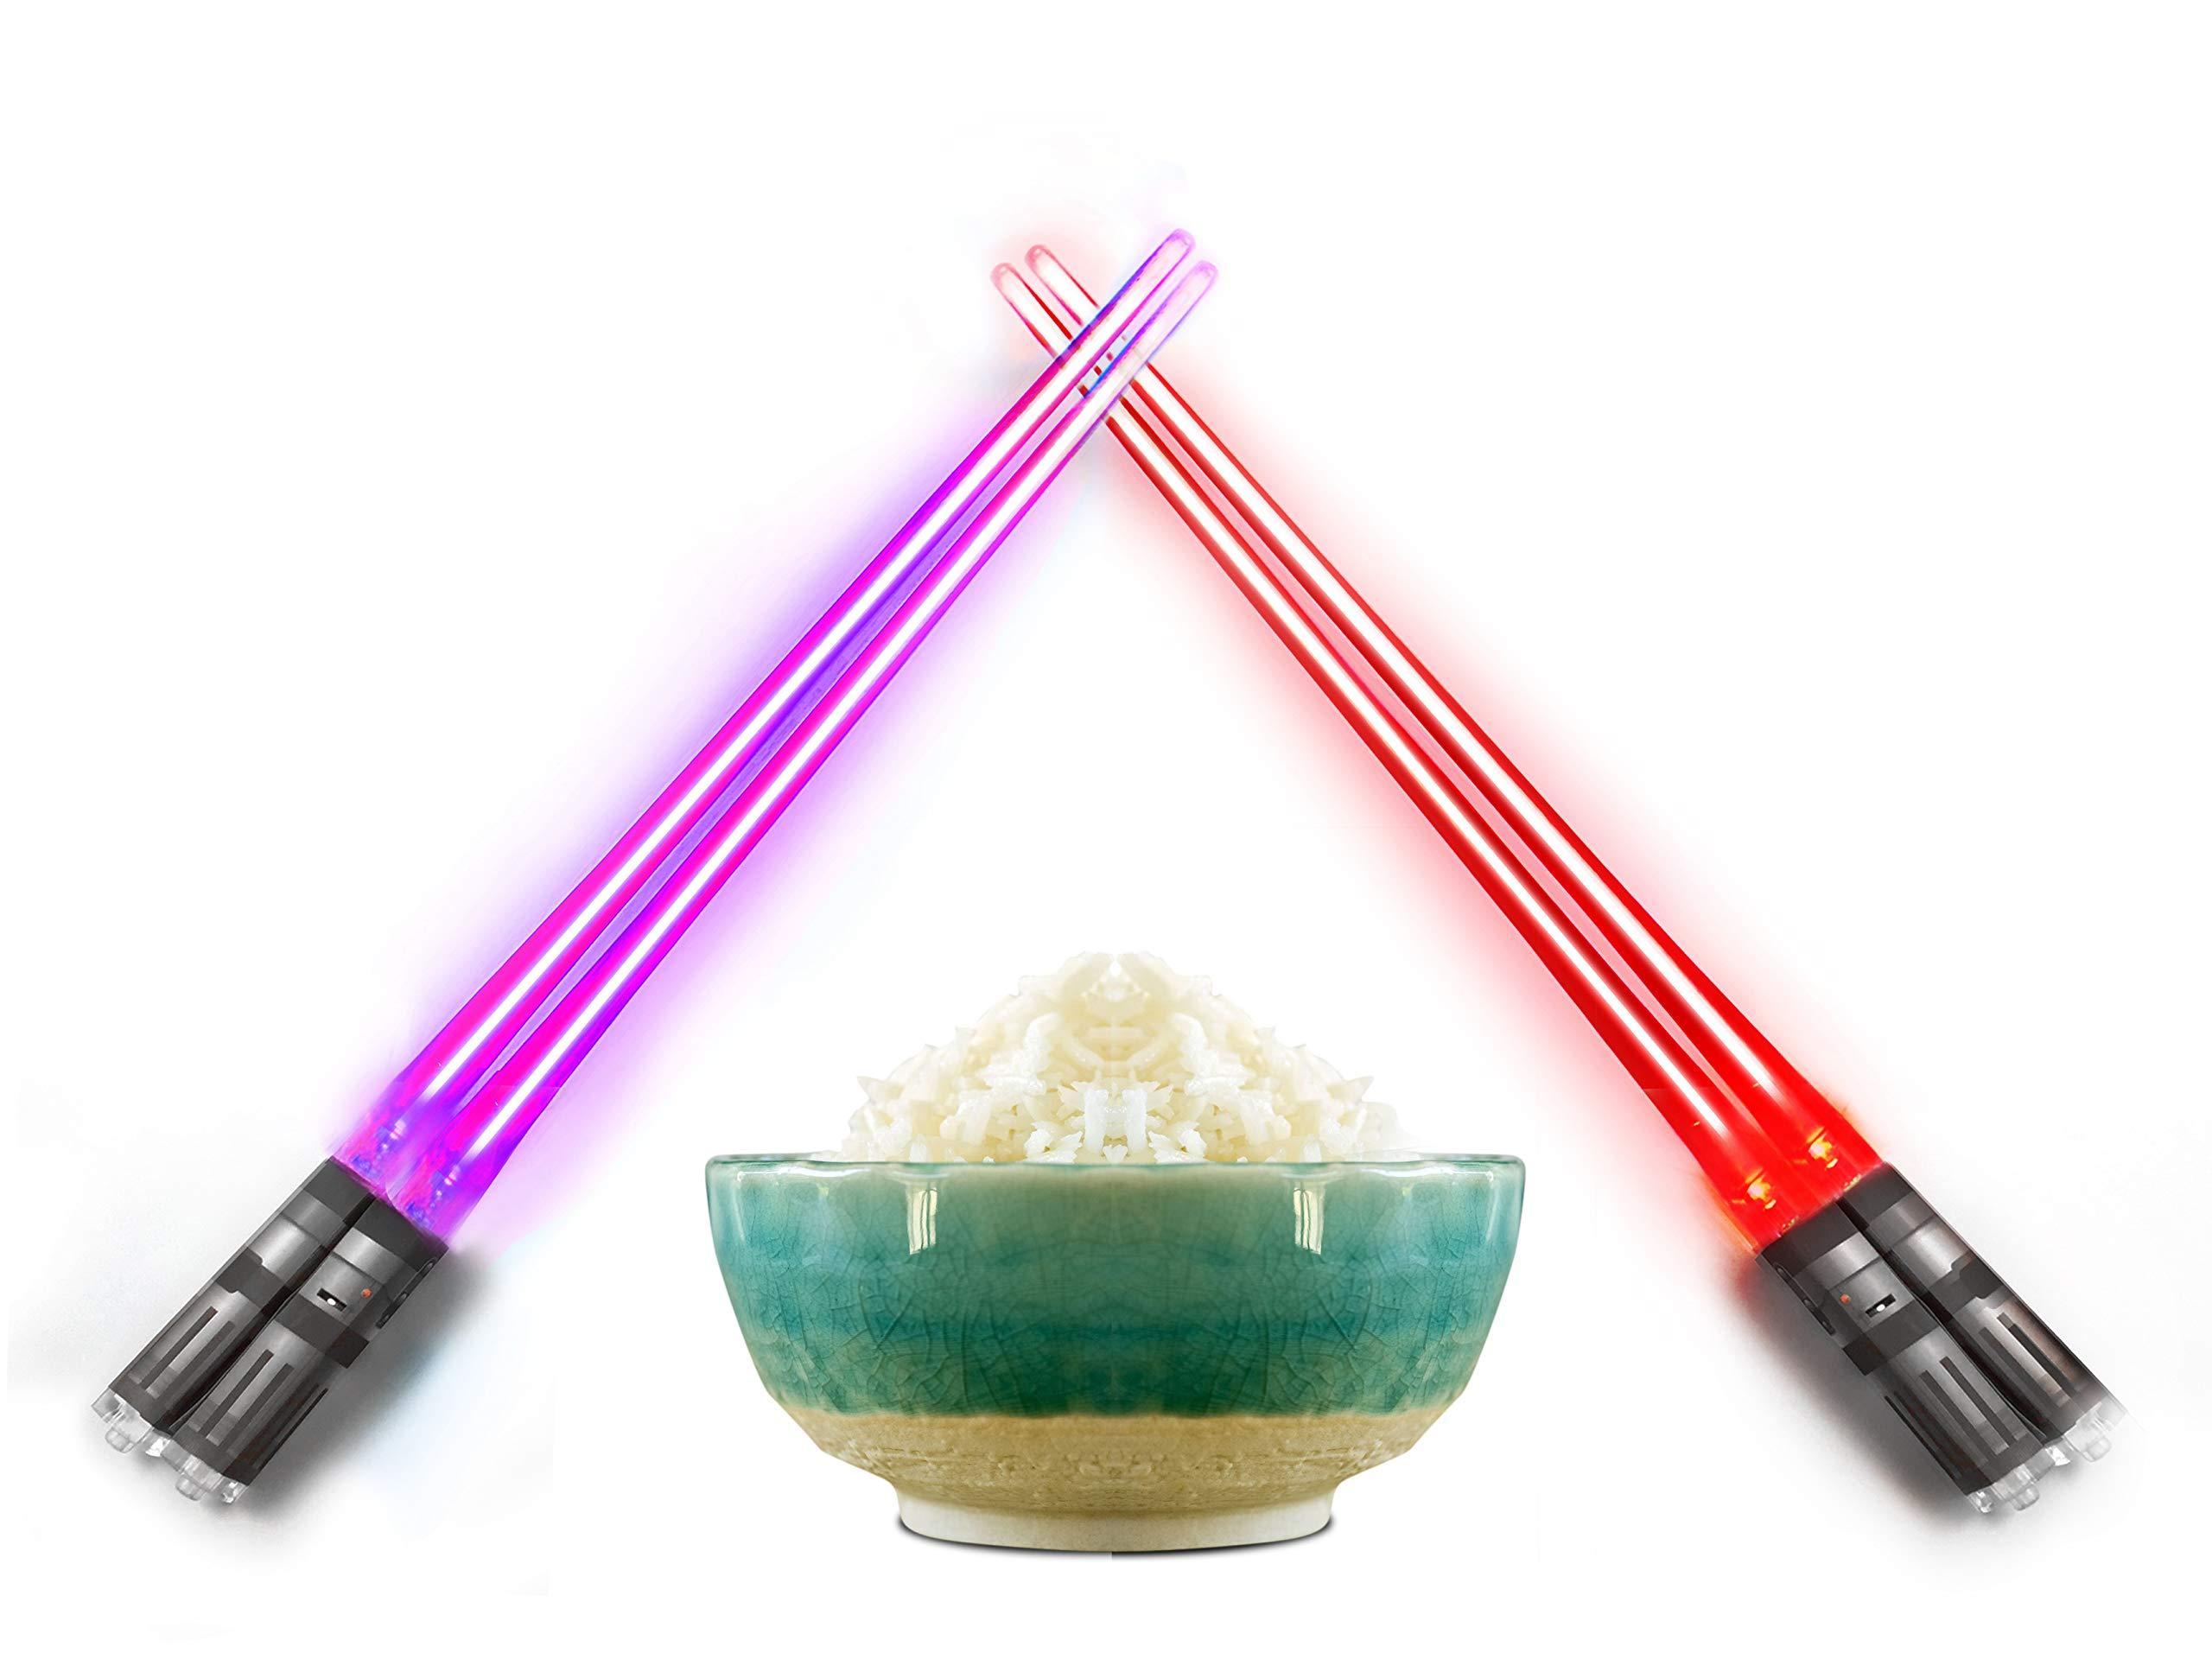 Lightsaber Light Up Chopsticks Led Chopstick, 2-Pairs, Purple & Red